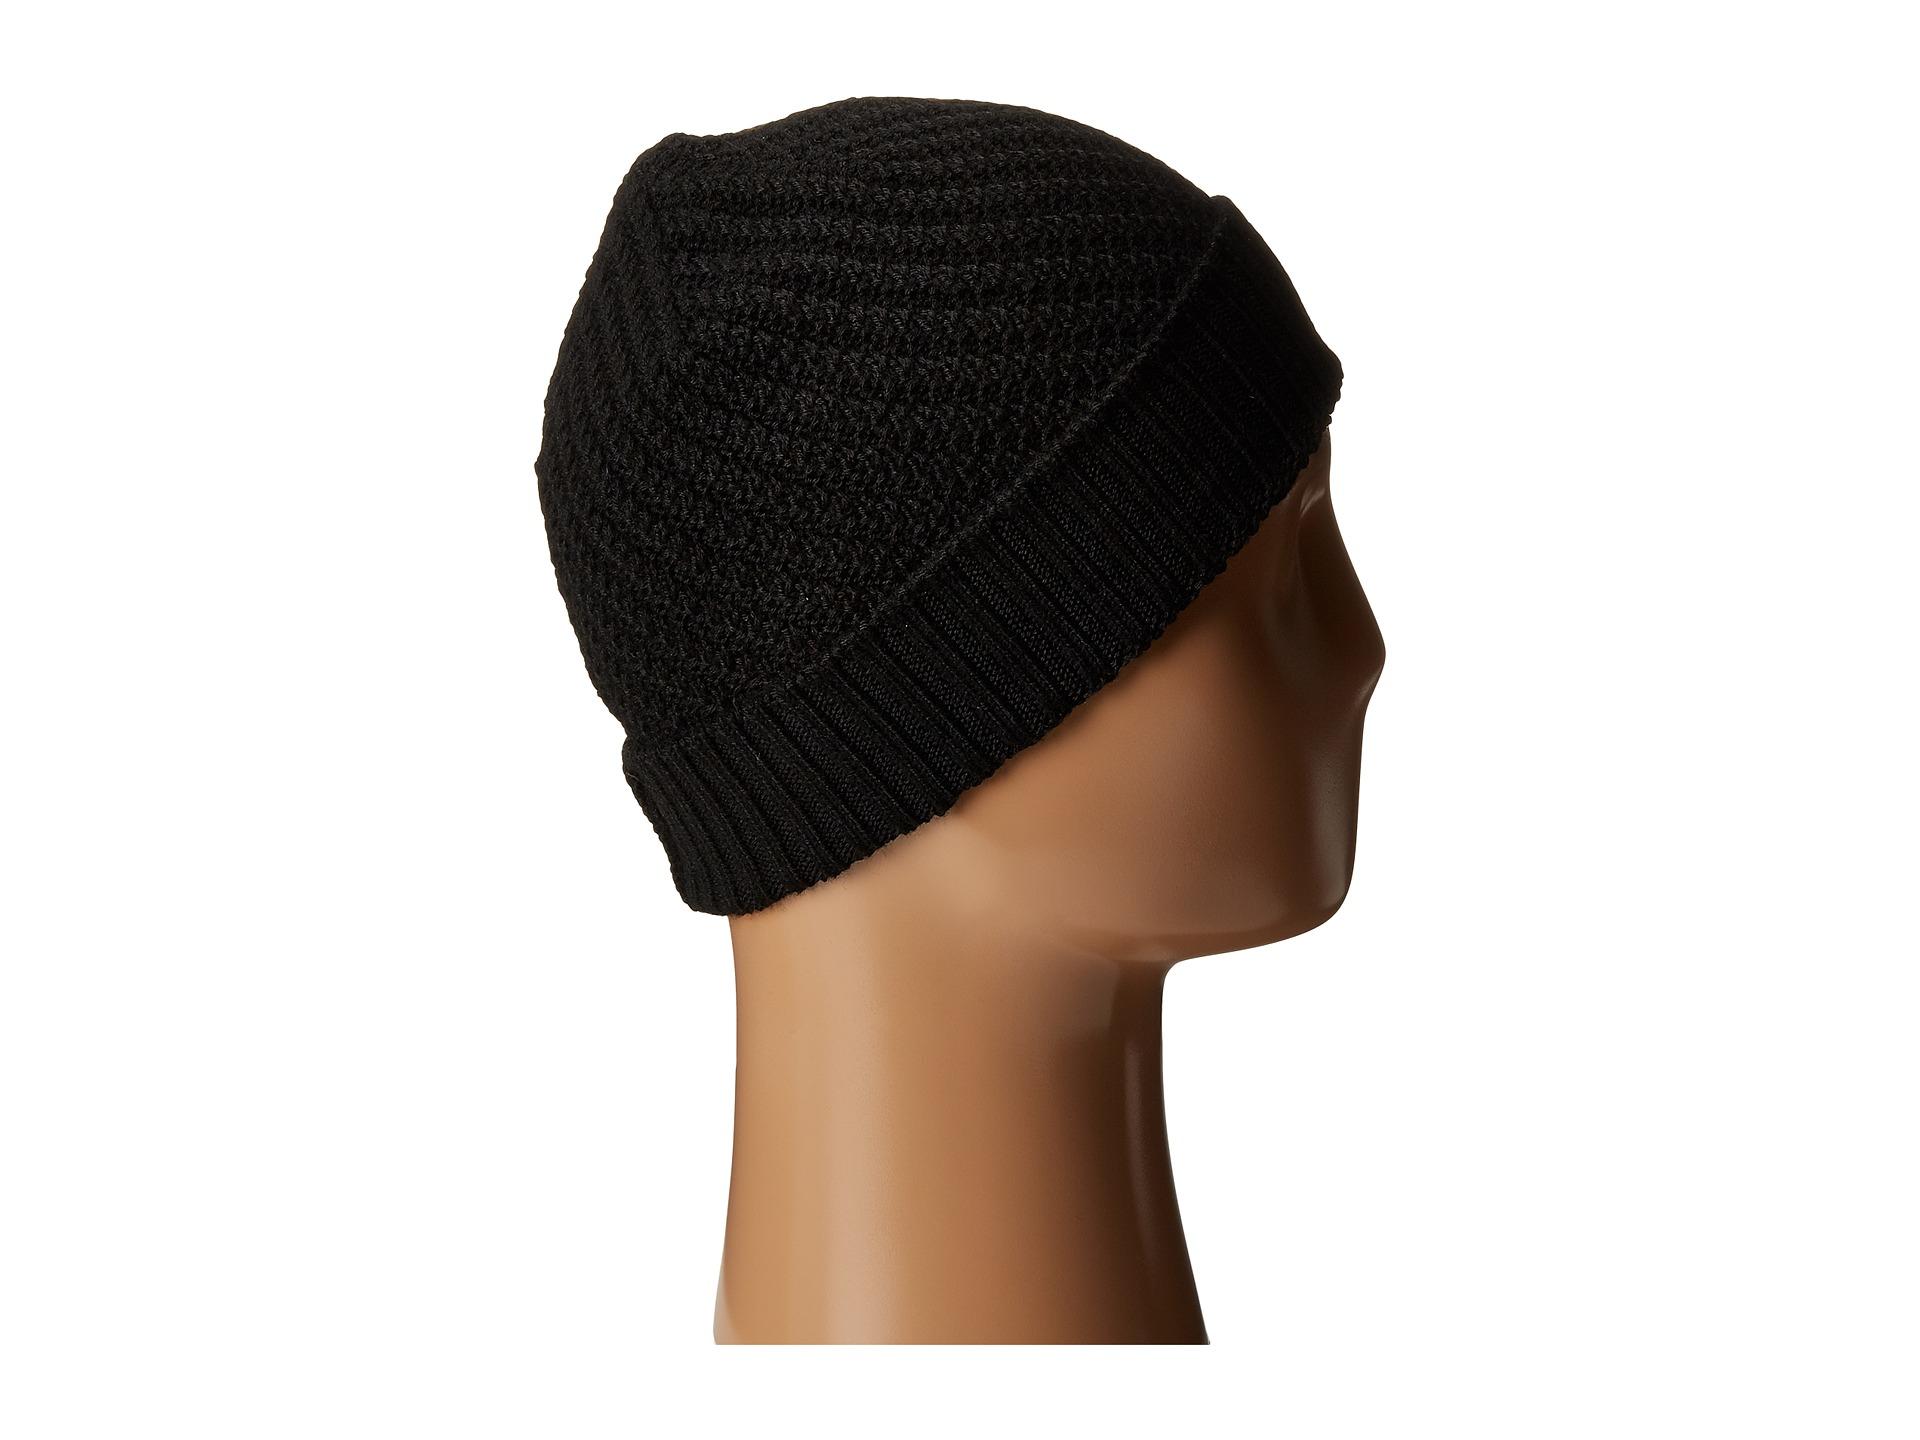 Lyst - Icebreaker Skyline Hat in Black 7c71df7988b4